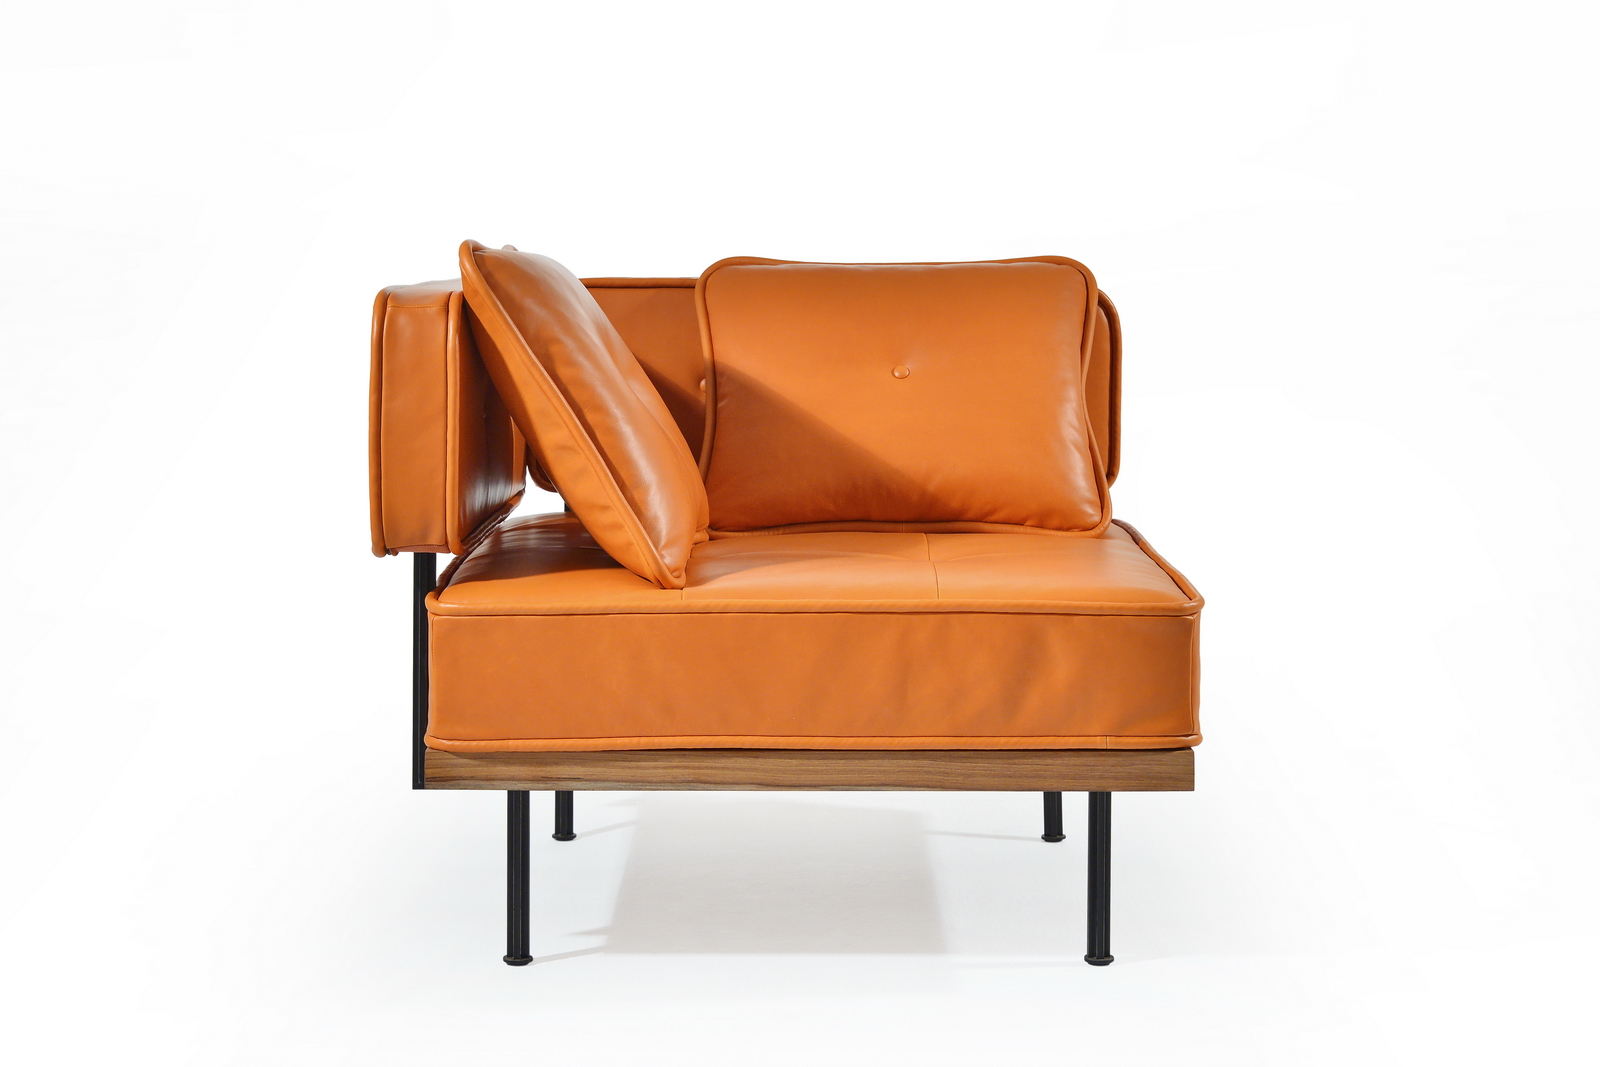 PTendercool-Sofa Corner-BS3-TE-BL-NO-Leather-210623-20